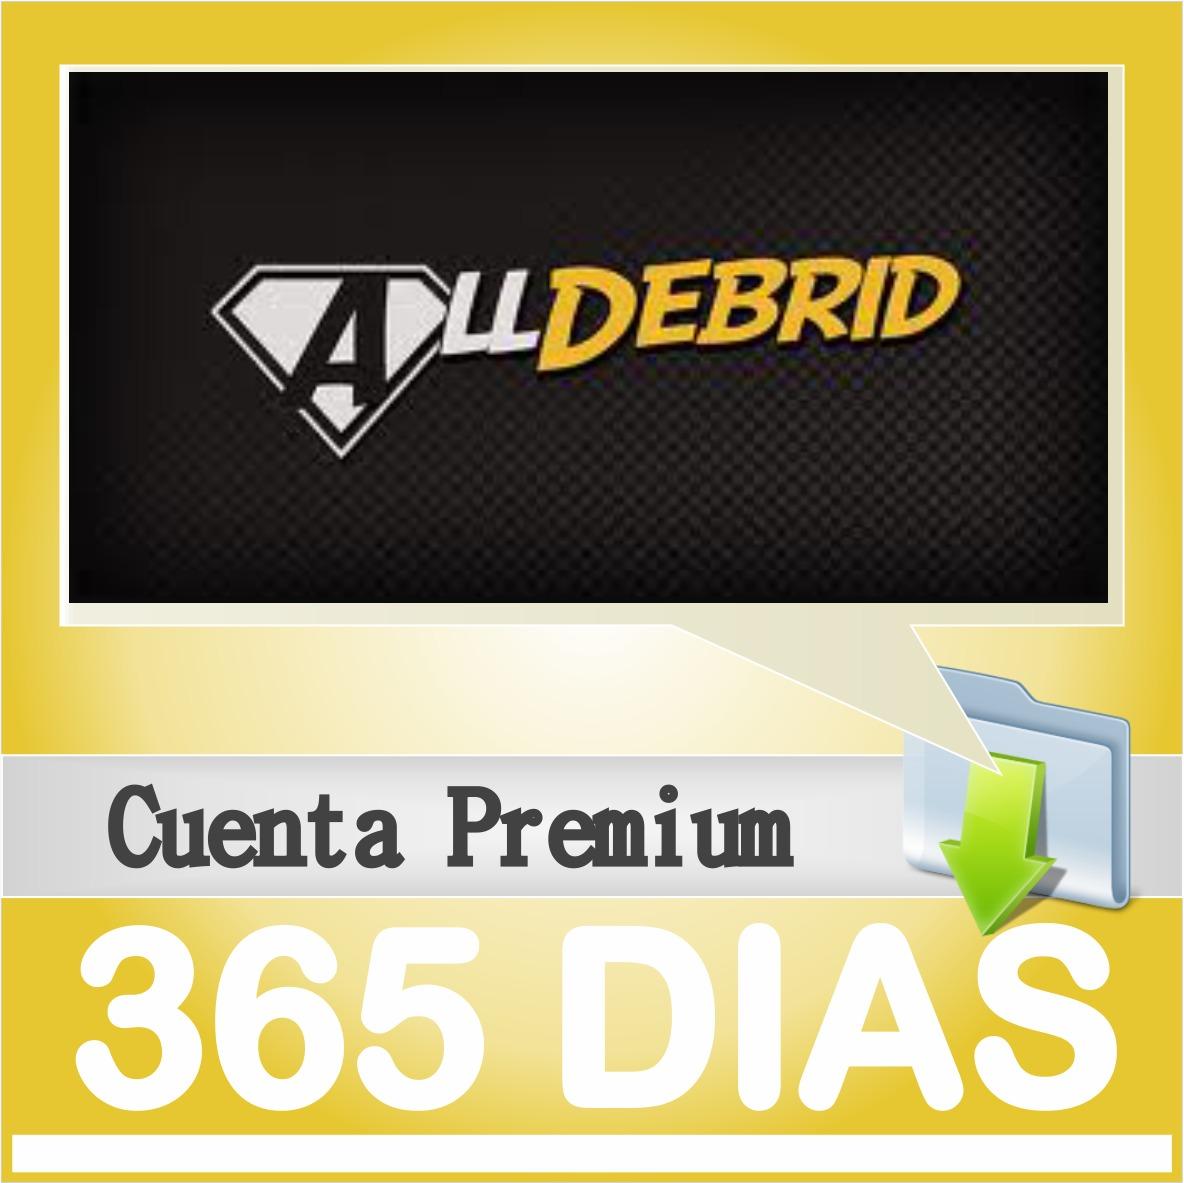 Cuentas Premium Alldebrid X 365 Dias | 1 Año Garantizadas!